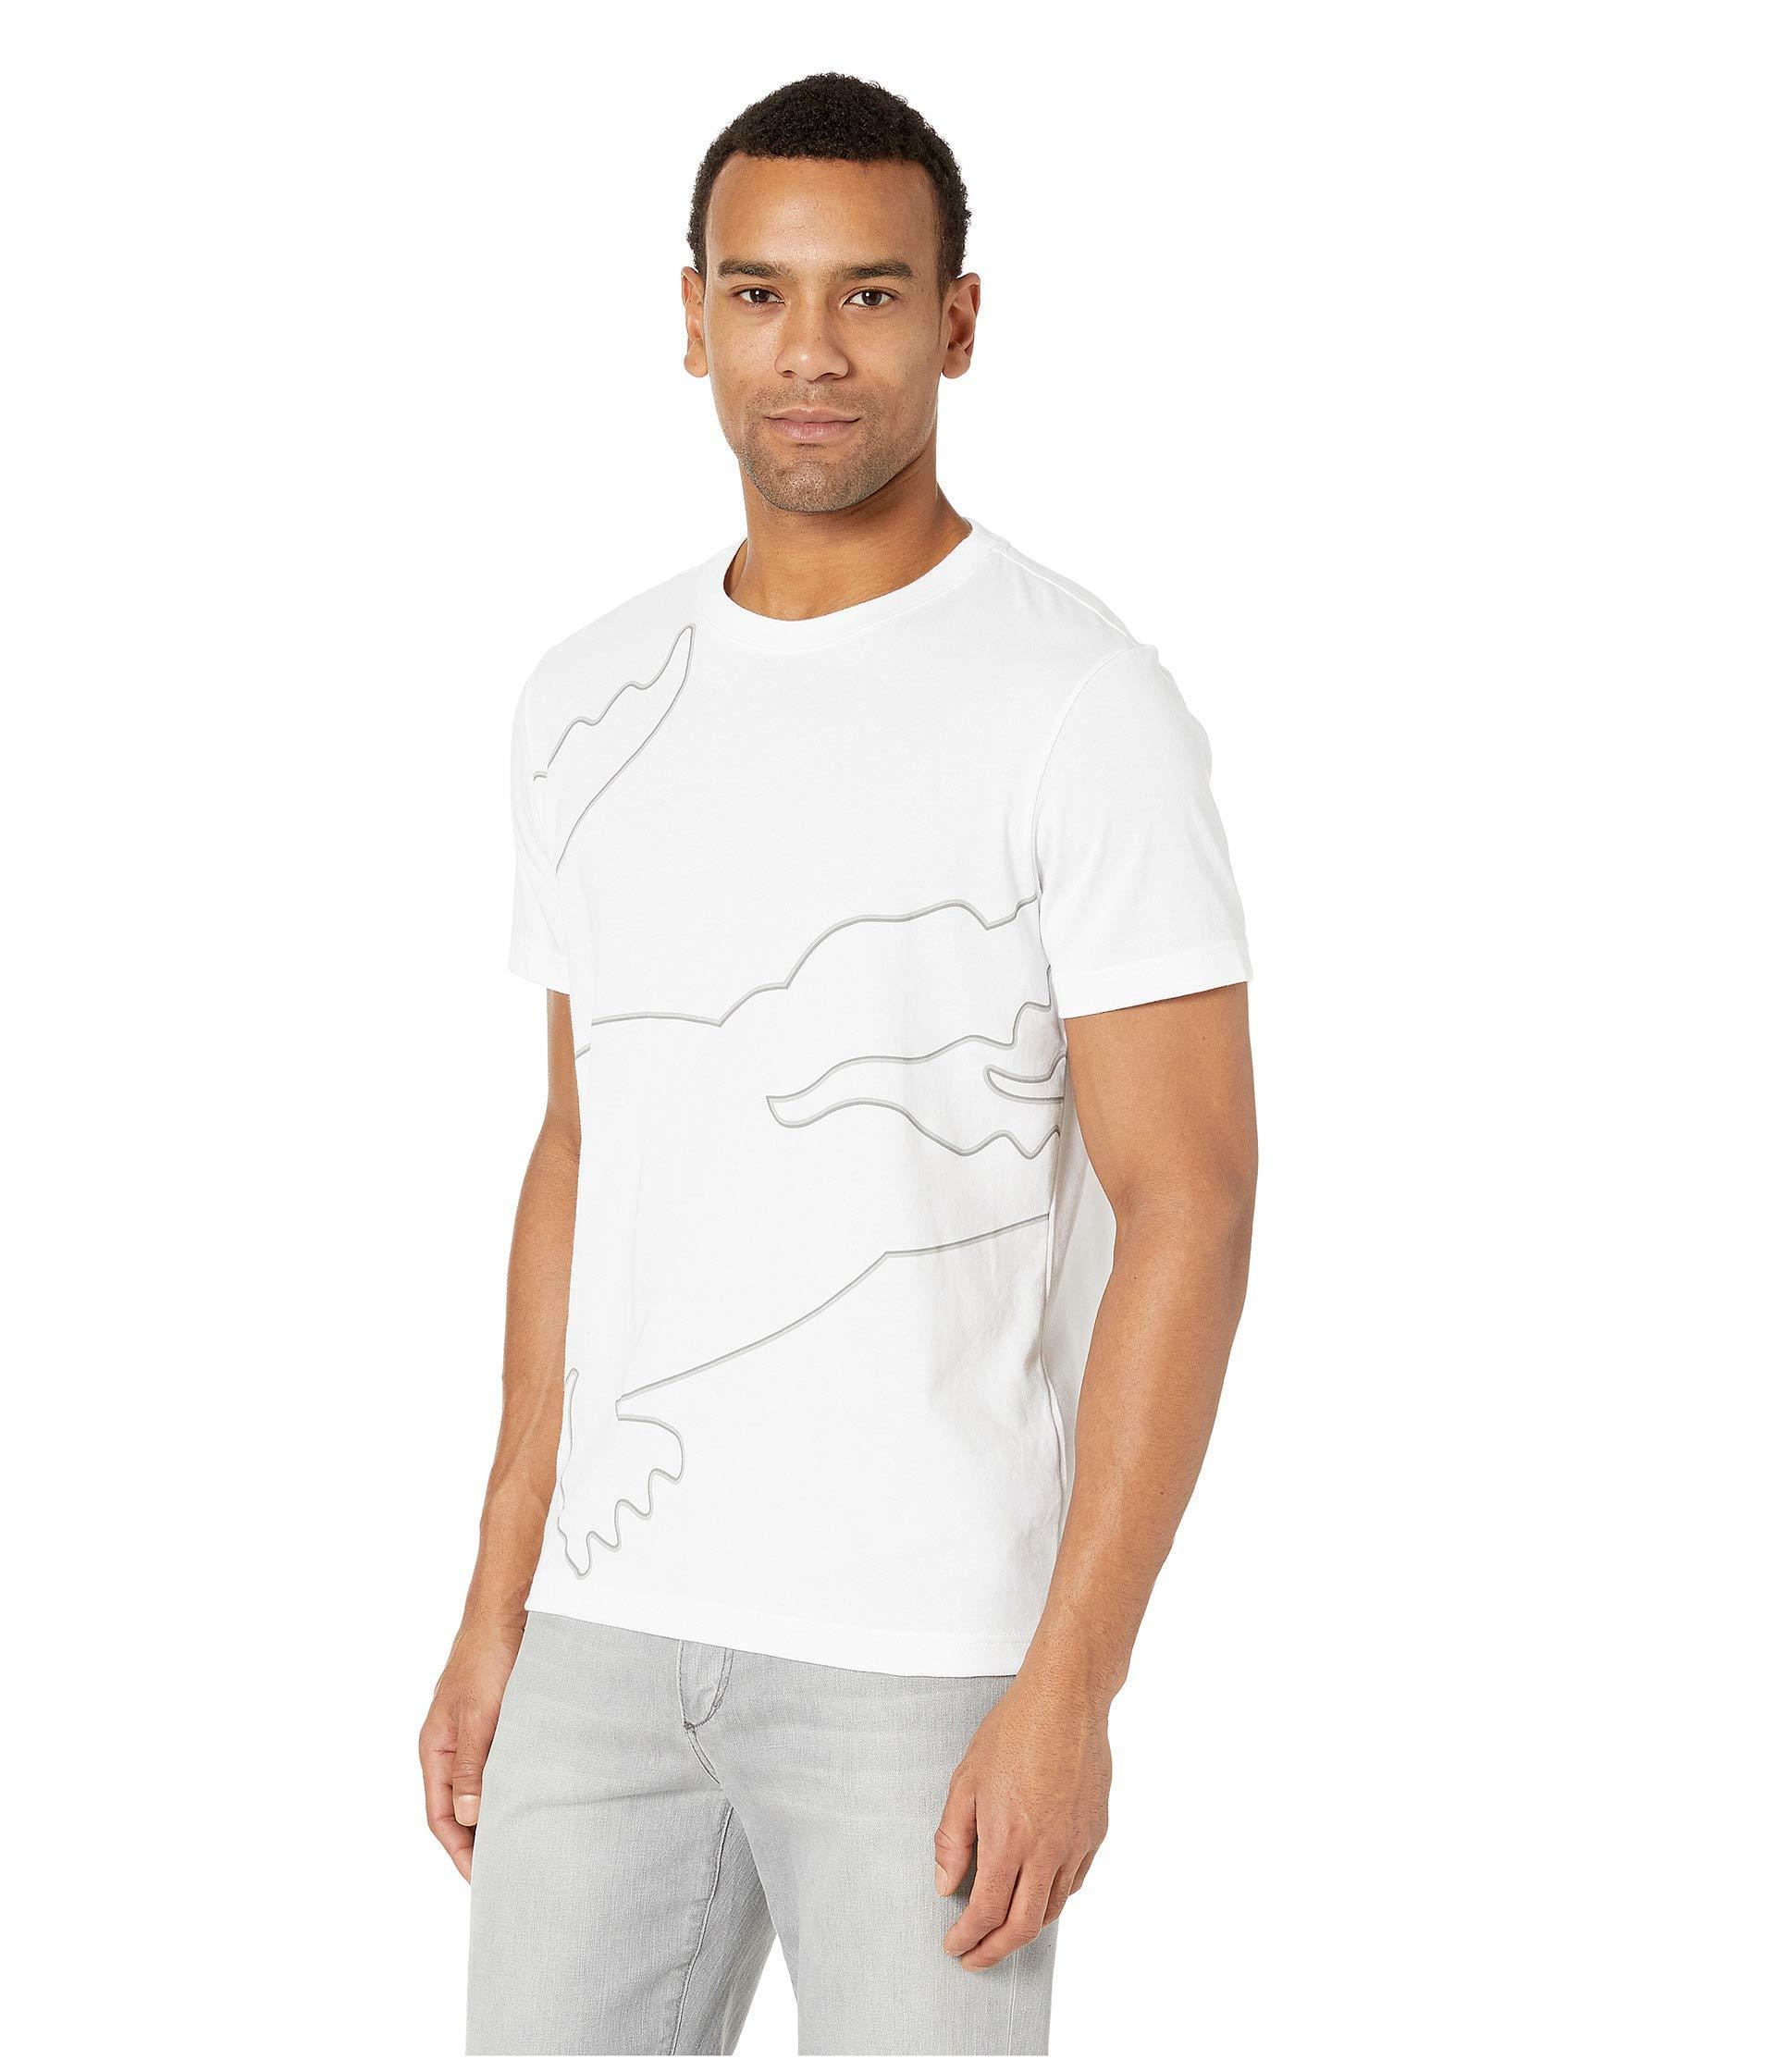 8d99a0c7af3c Lyst - Lacoste Sport Short Sleeve Outlined Big Croc T-shirt in White for Men